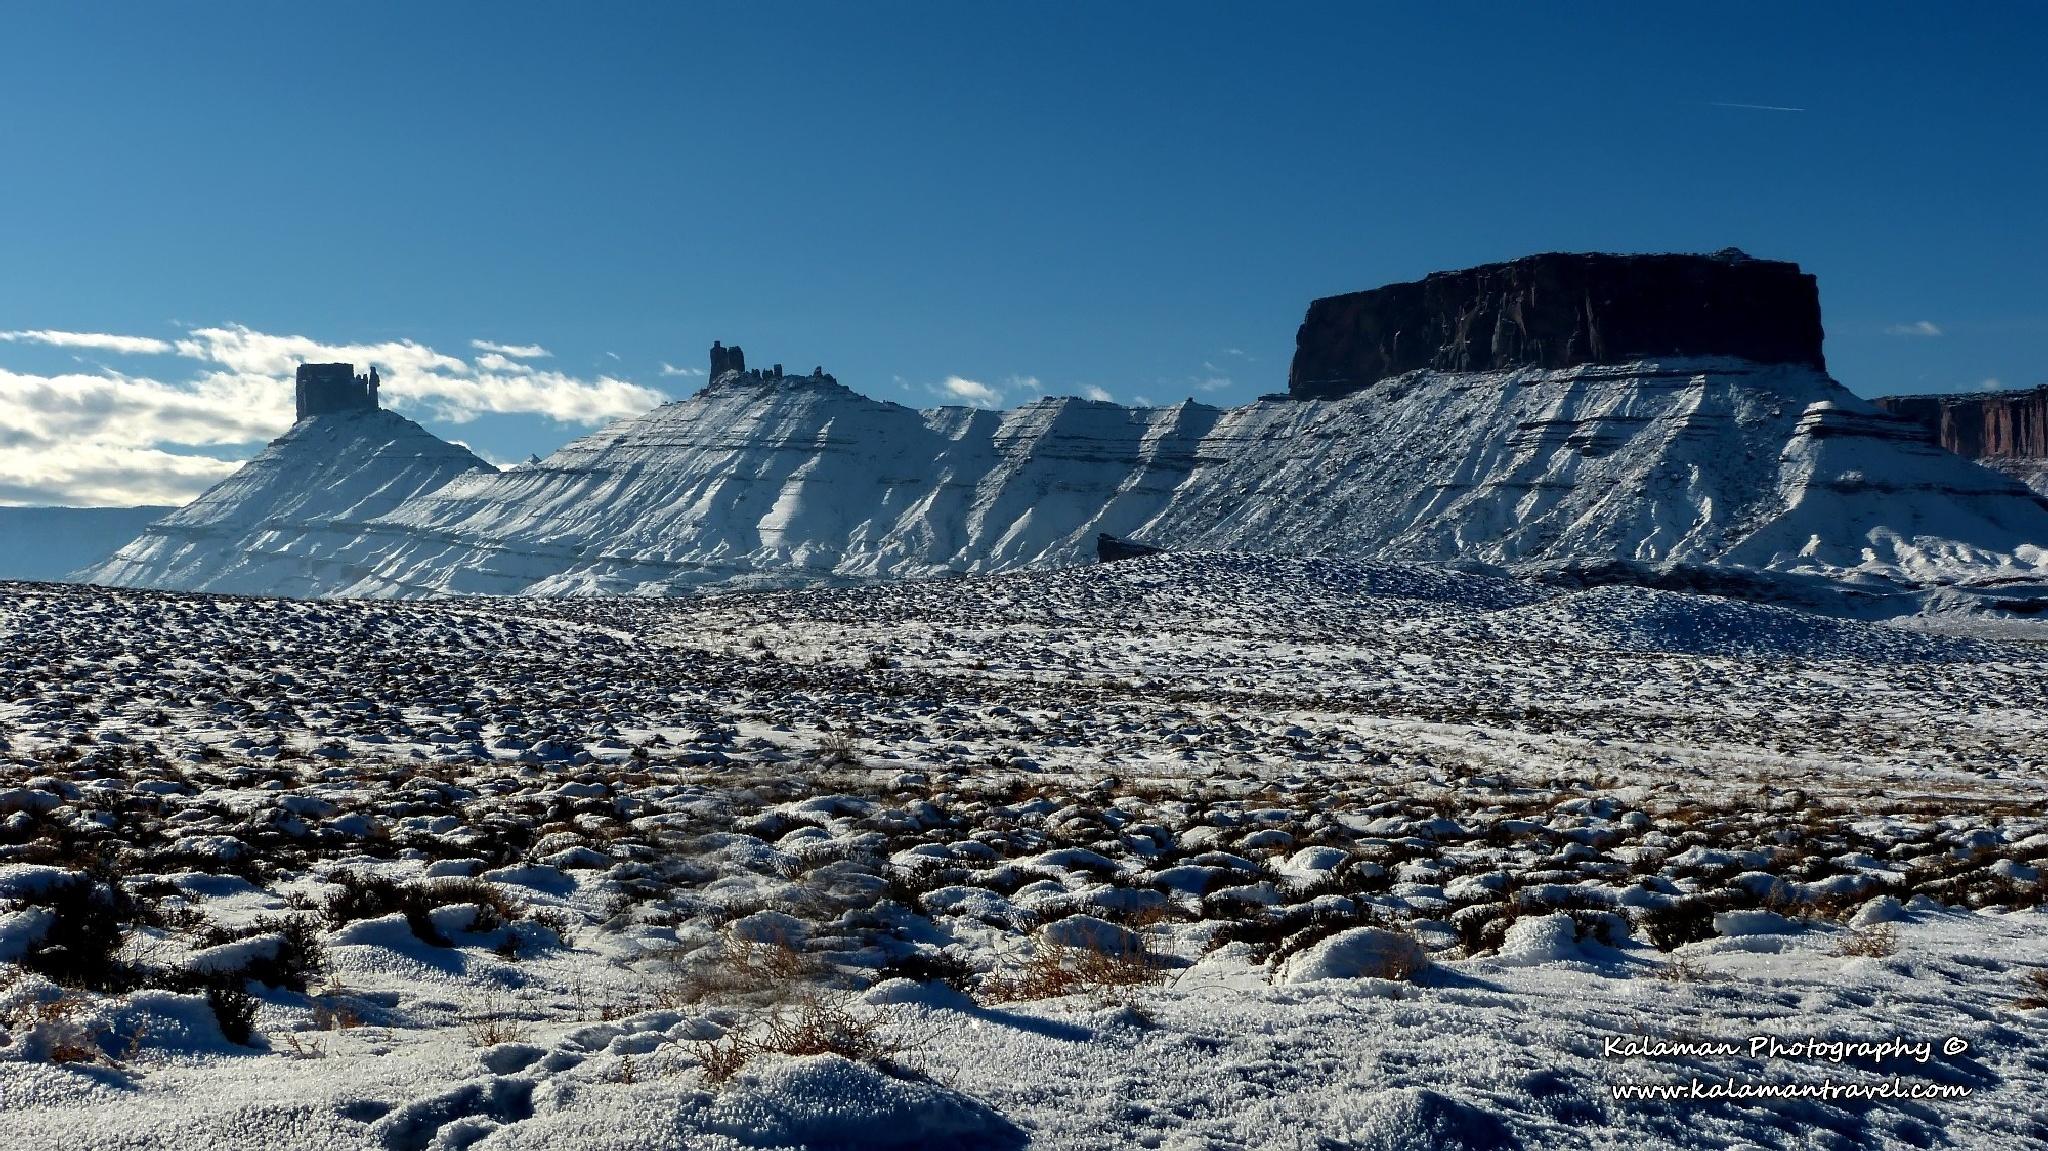 Winter in Utah by Kalaman Photography